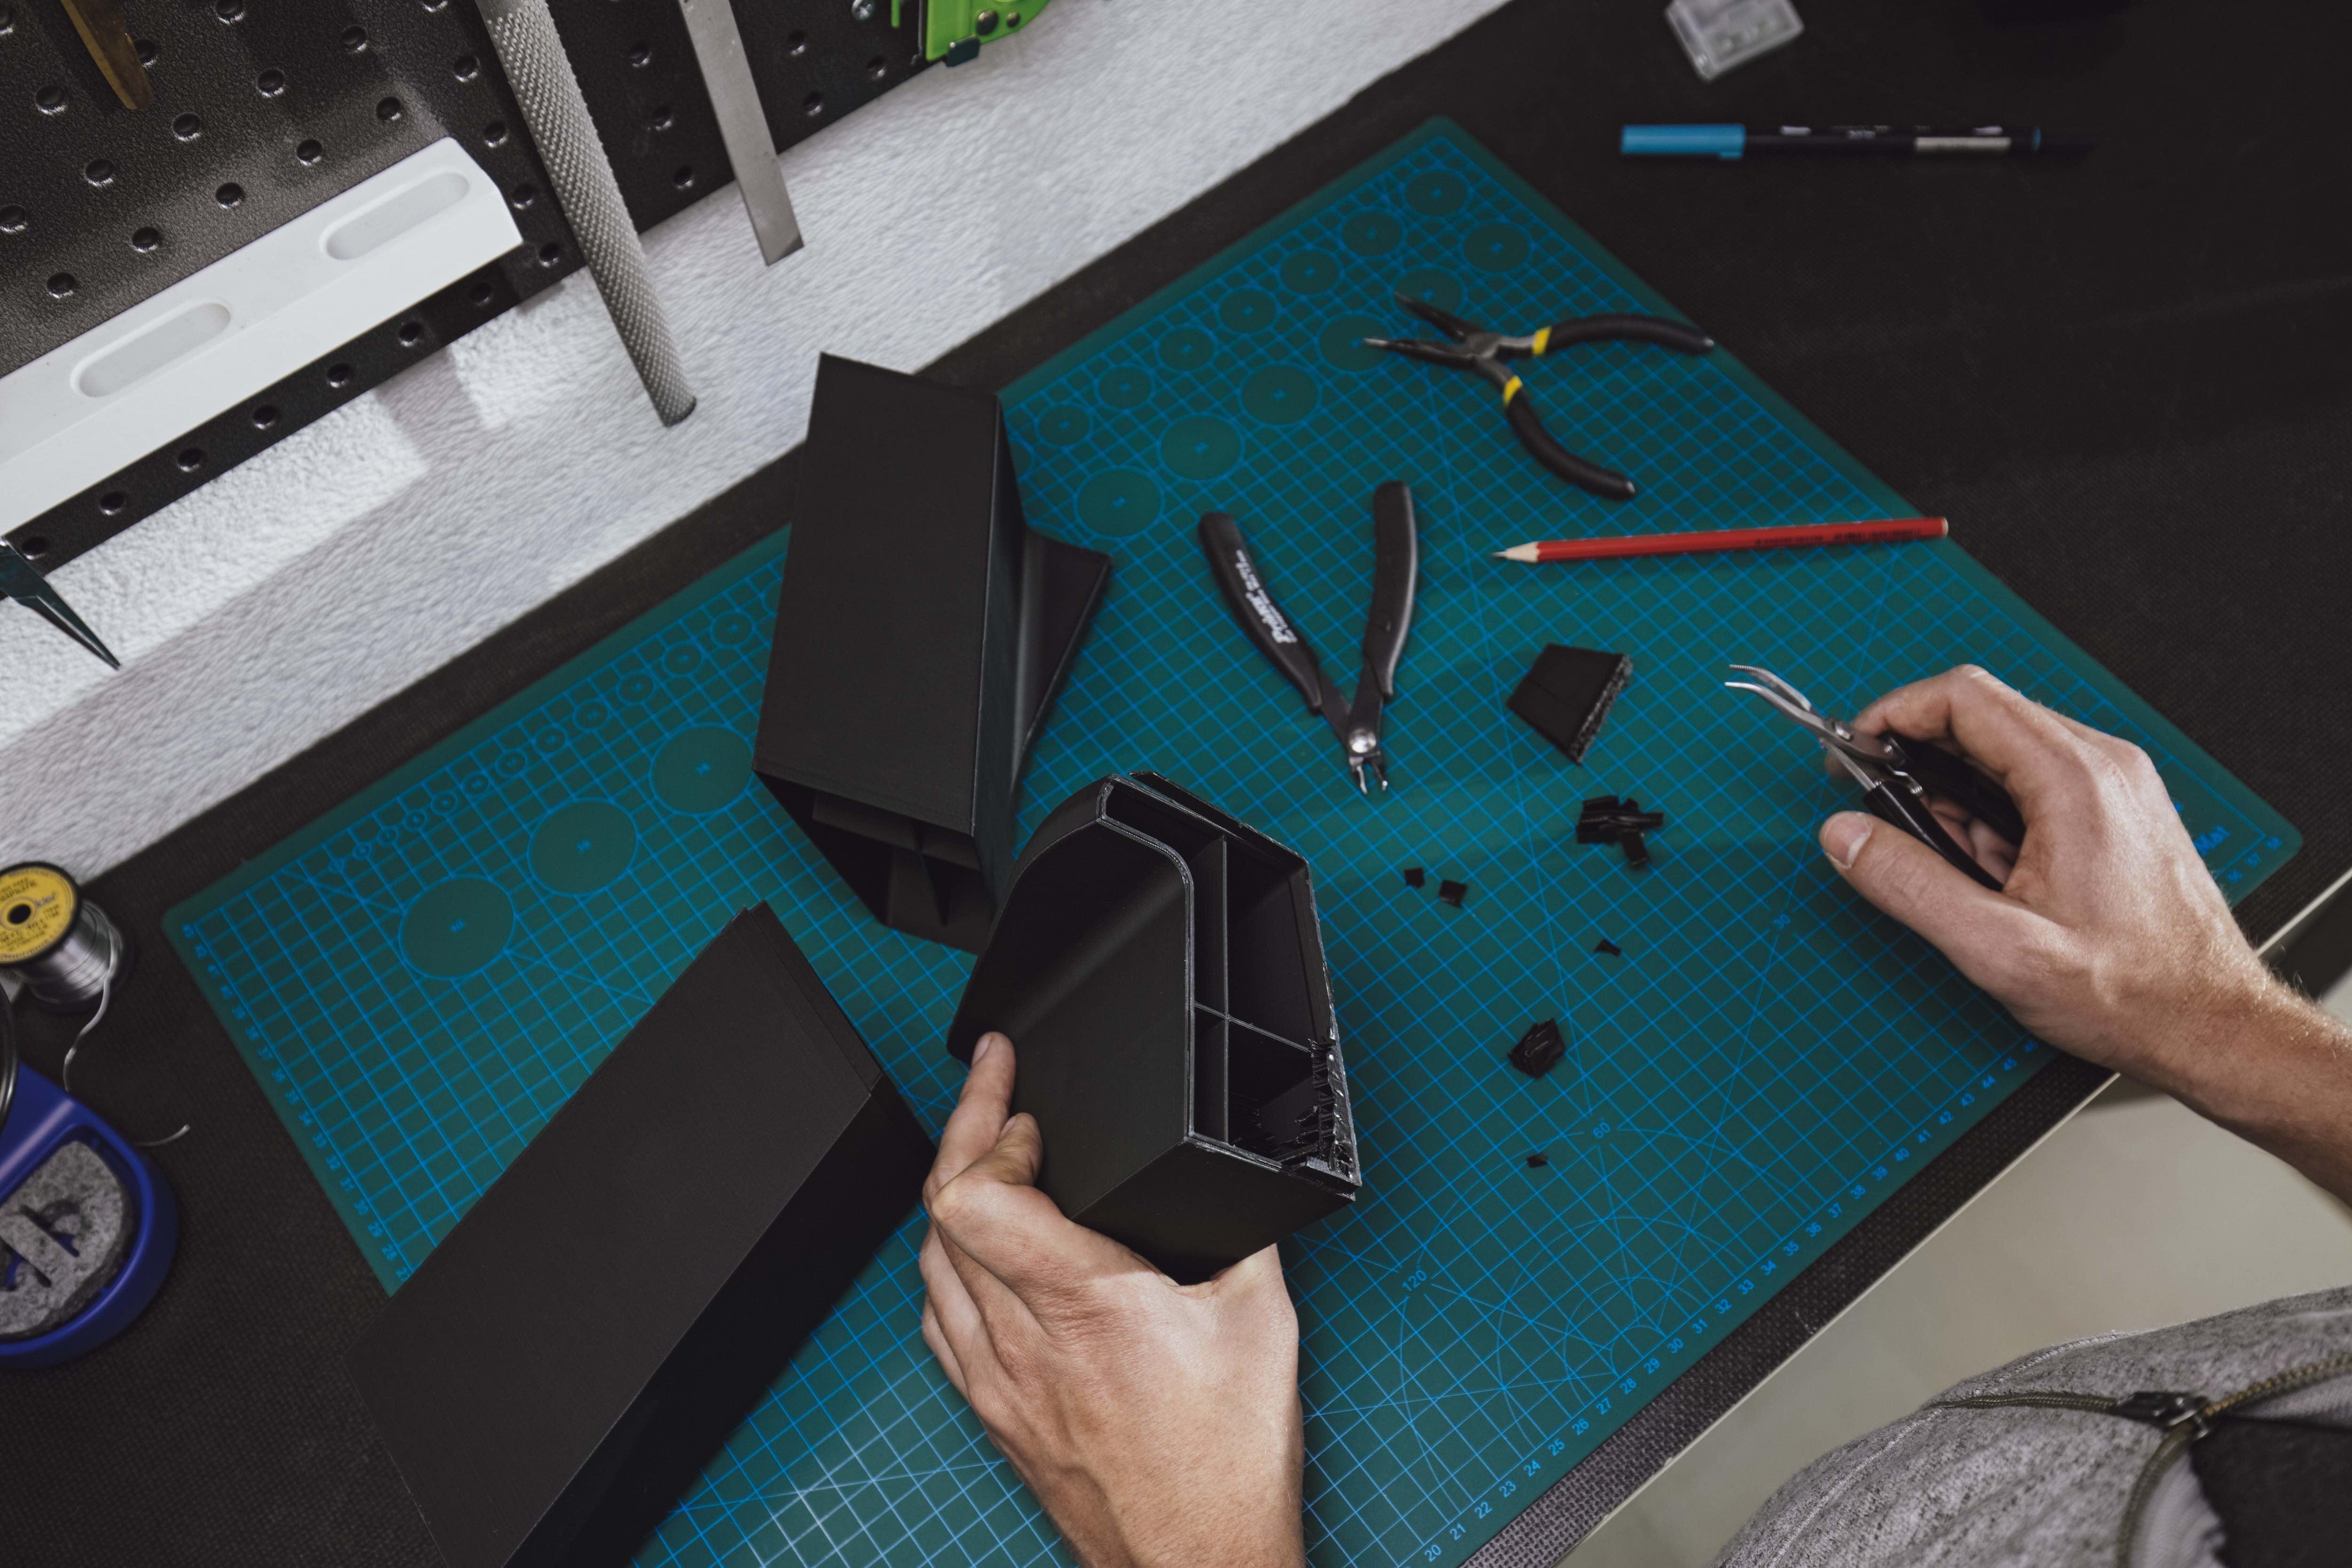 Post-processing of 3D print